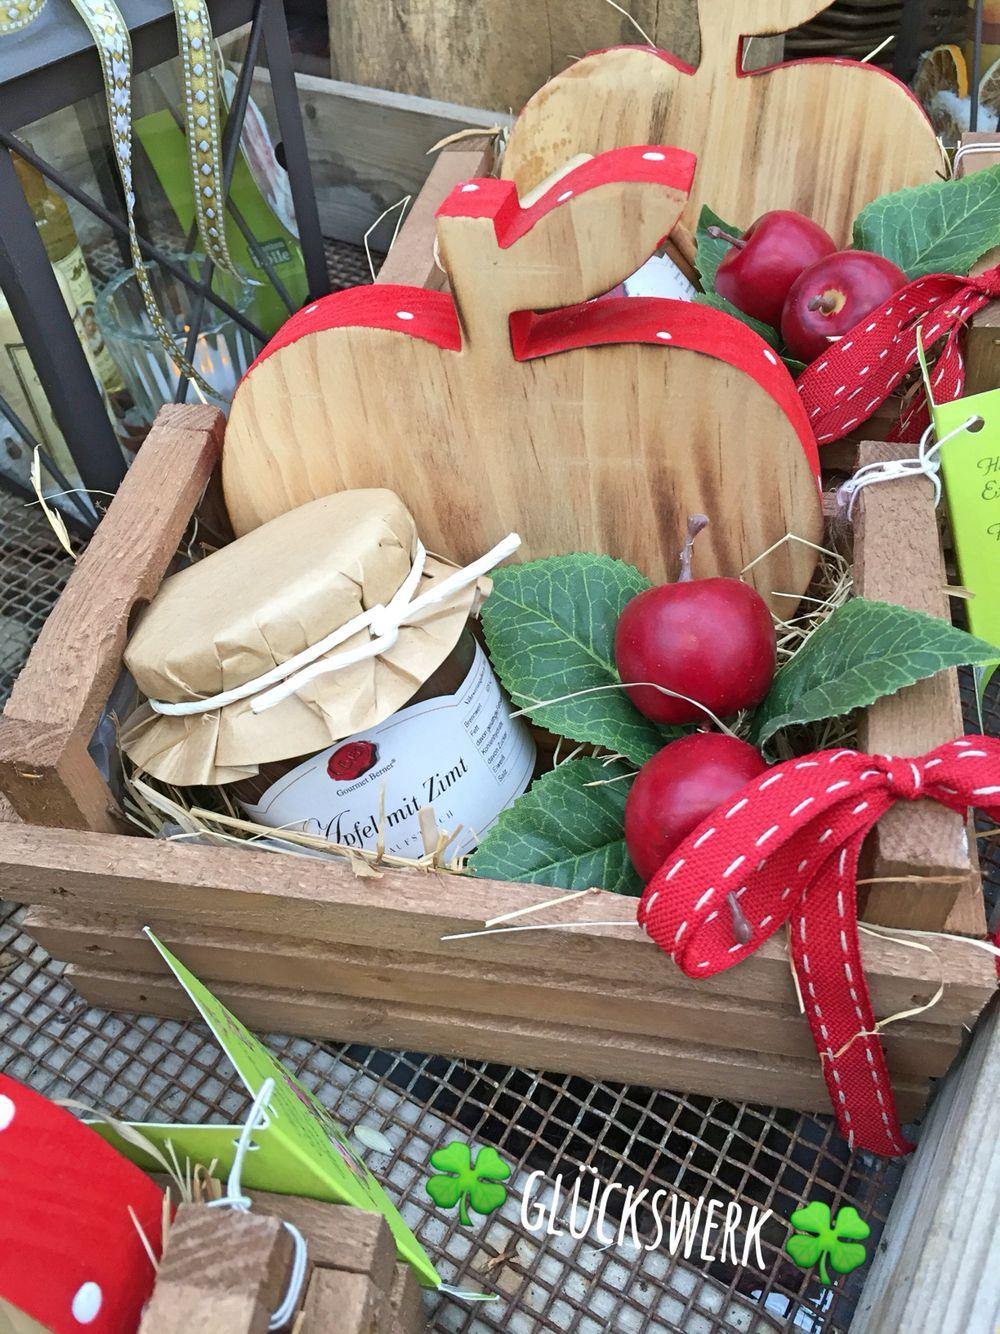 Alles Apfel - bezaubernder Geschenke-Korb mit Biss! www.glueckswerk-magazin.de